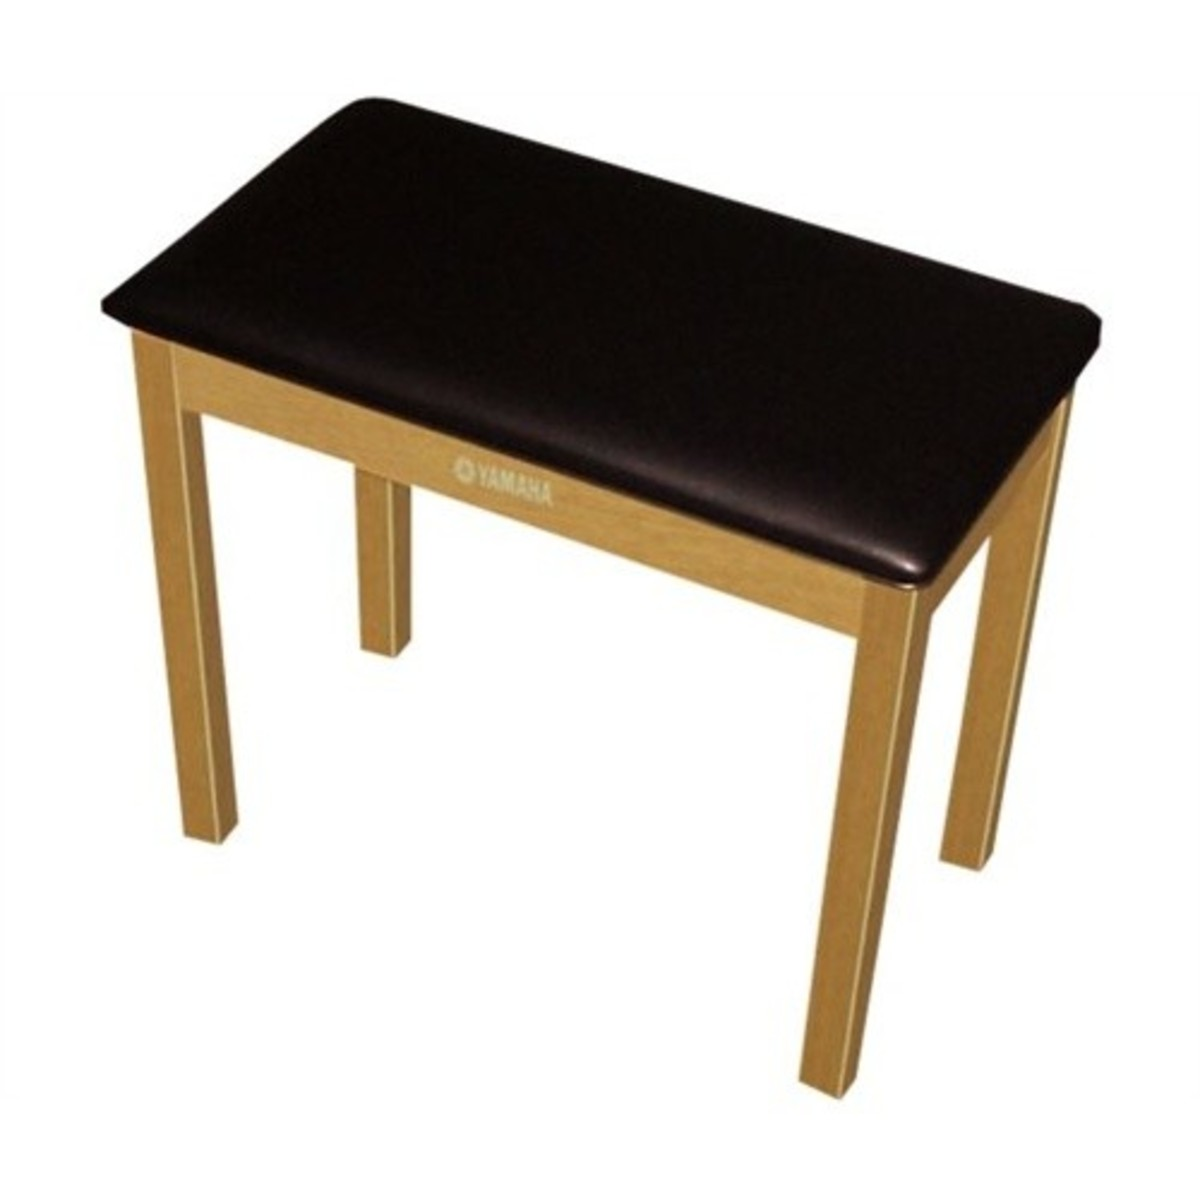 yamaha b1c3 banc de piano cerisier. Black Bedroom Furniture Sets. Home Design Ideas